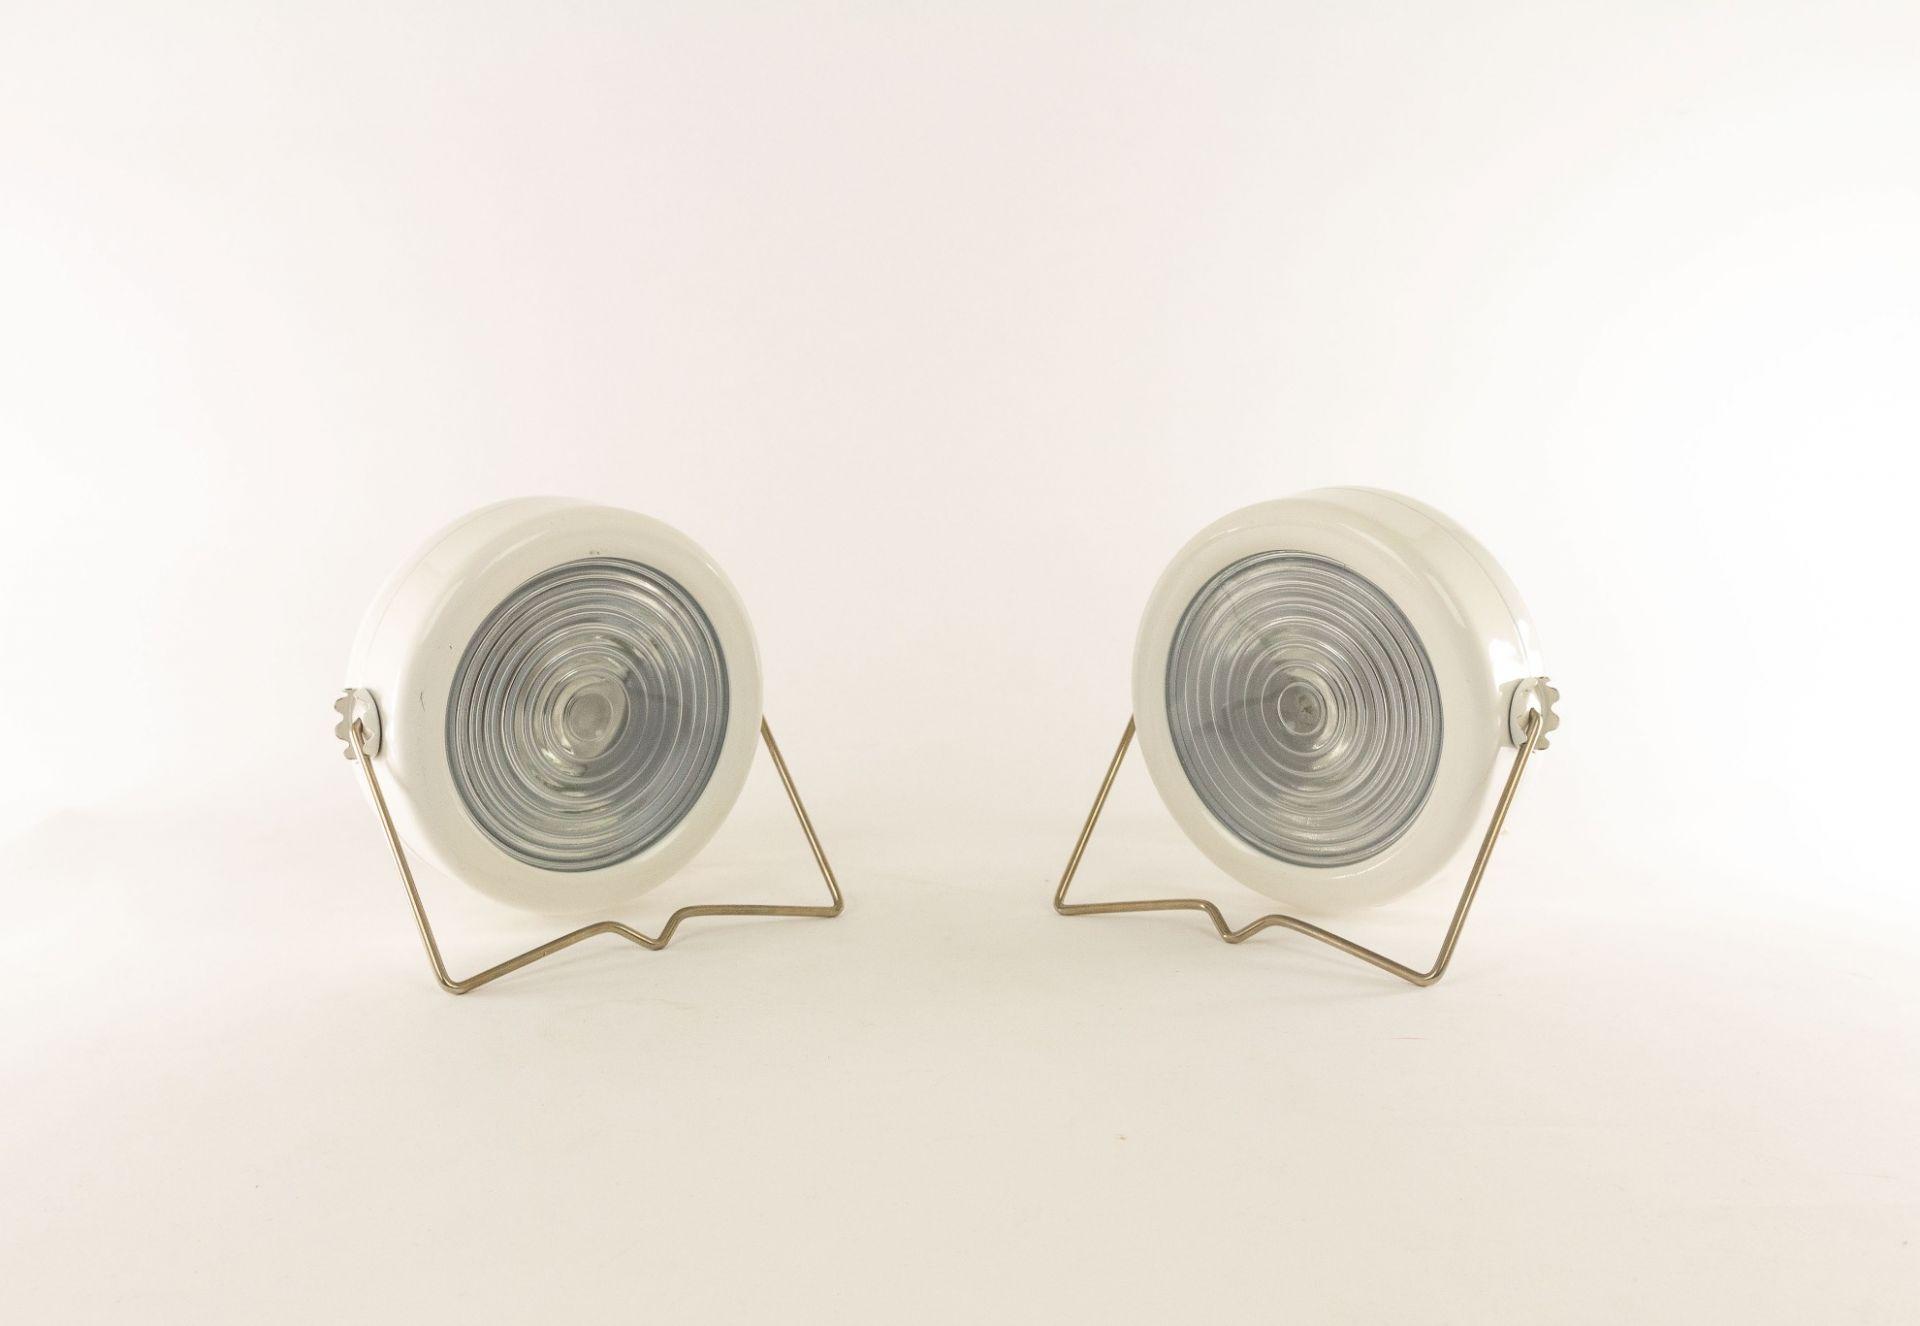 A pair of Sciuko table lamps by Achille & Pier Giacomo Castiglioni for Flos, 196